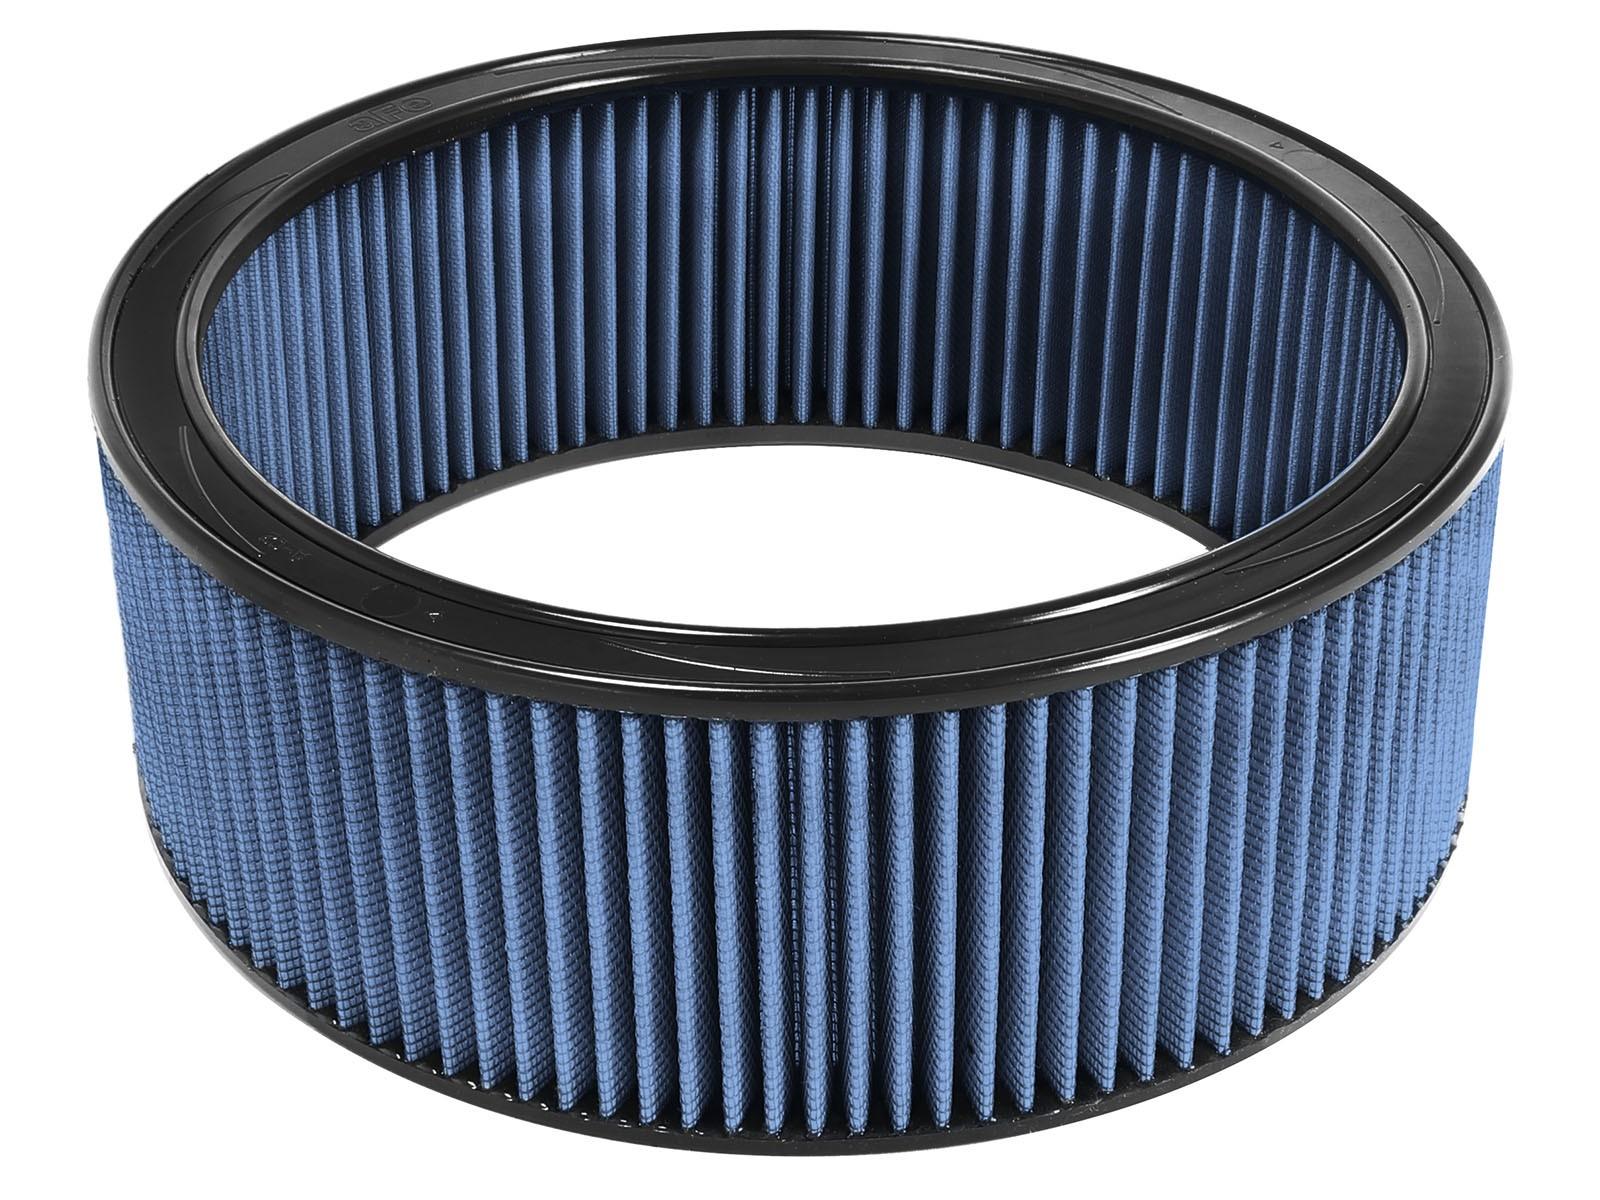 aFe POWER 10-10014 Magnum FLOW Pro 5R Air Filter